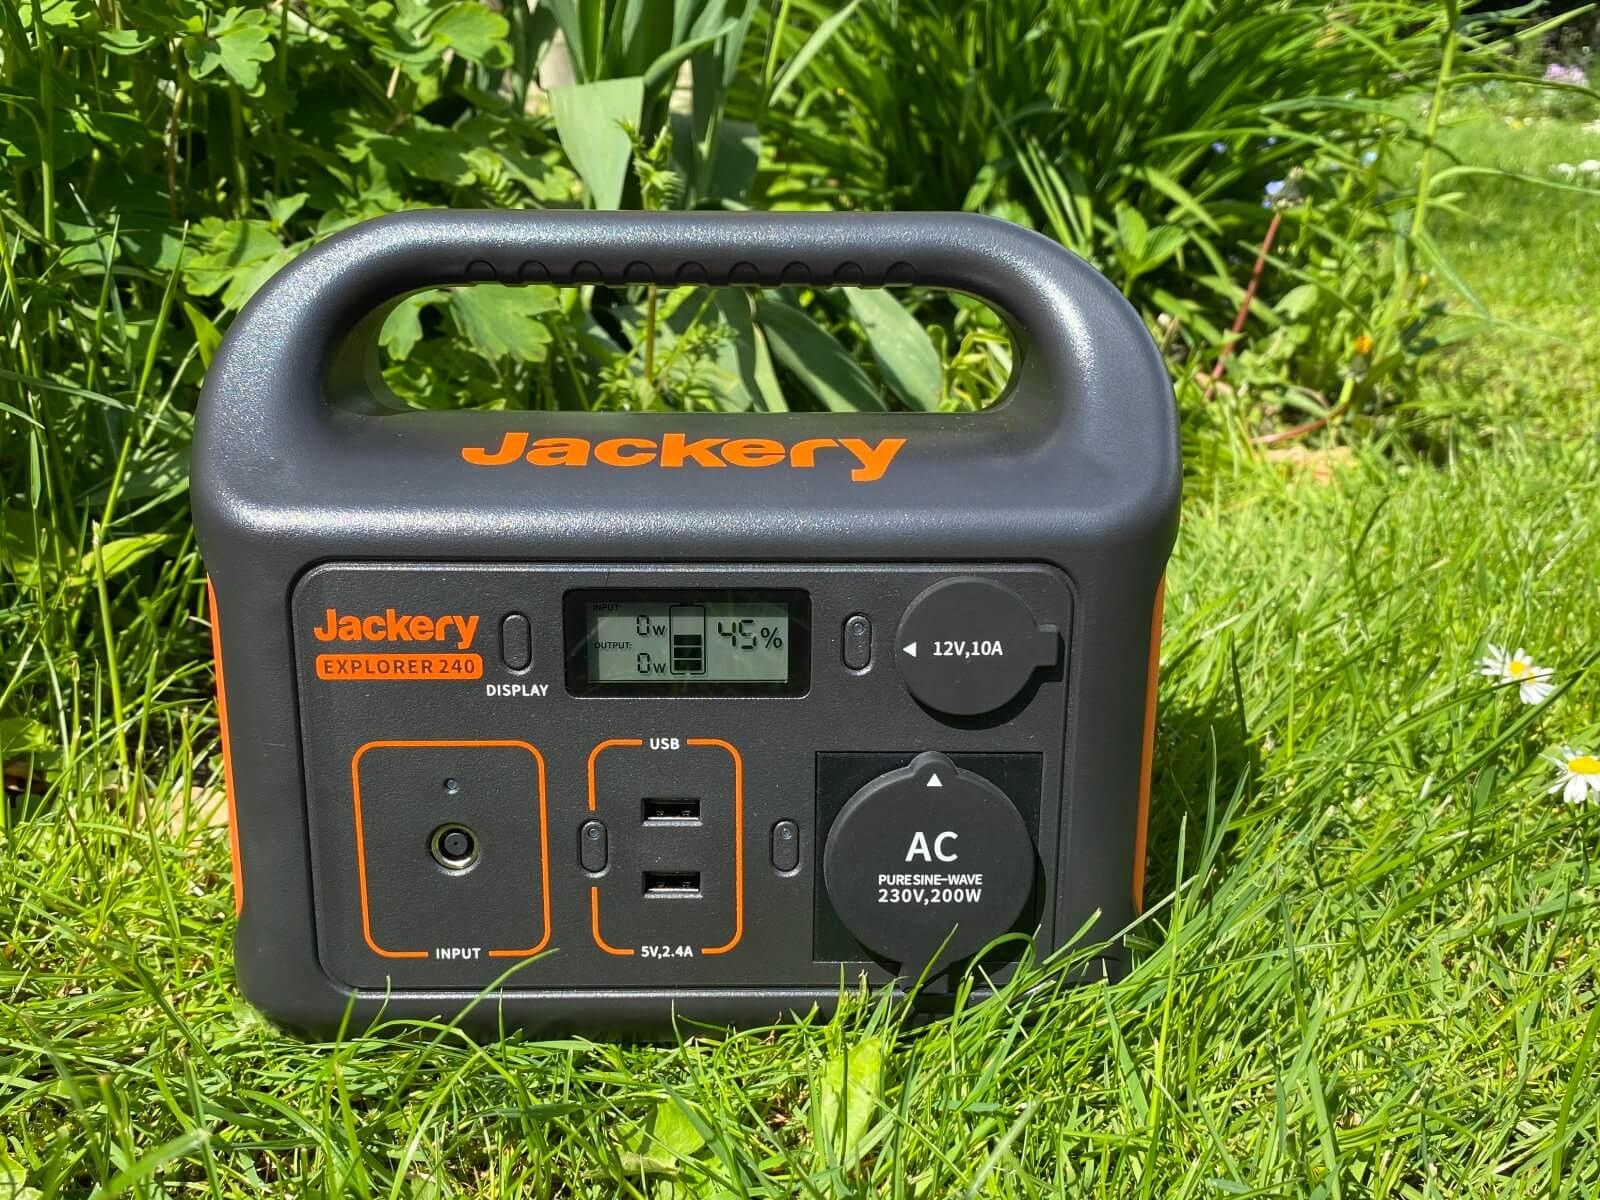 Jackery Explorer 240 Power Station Test - Titelbild